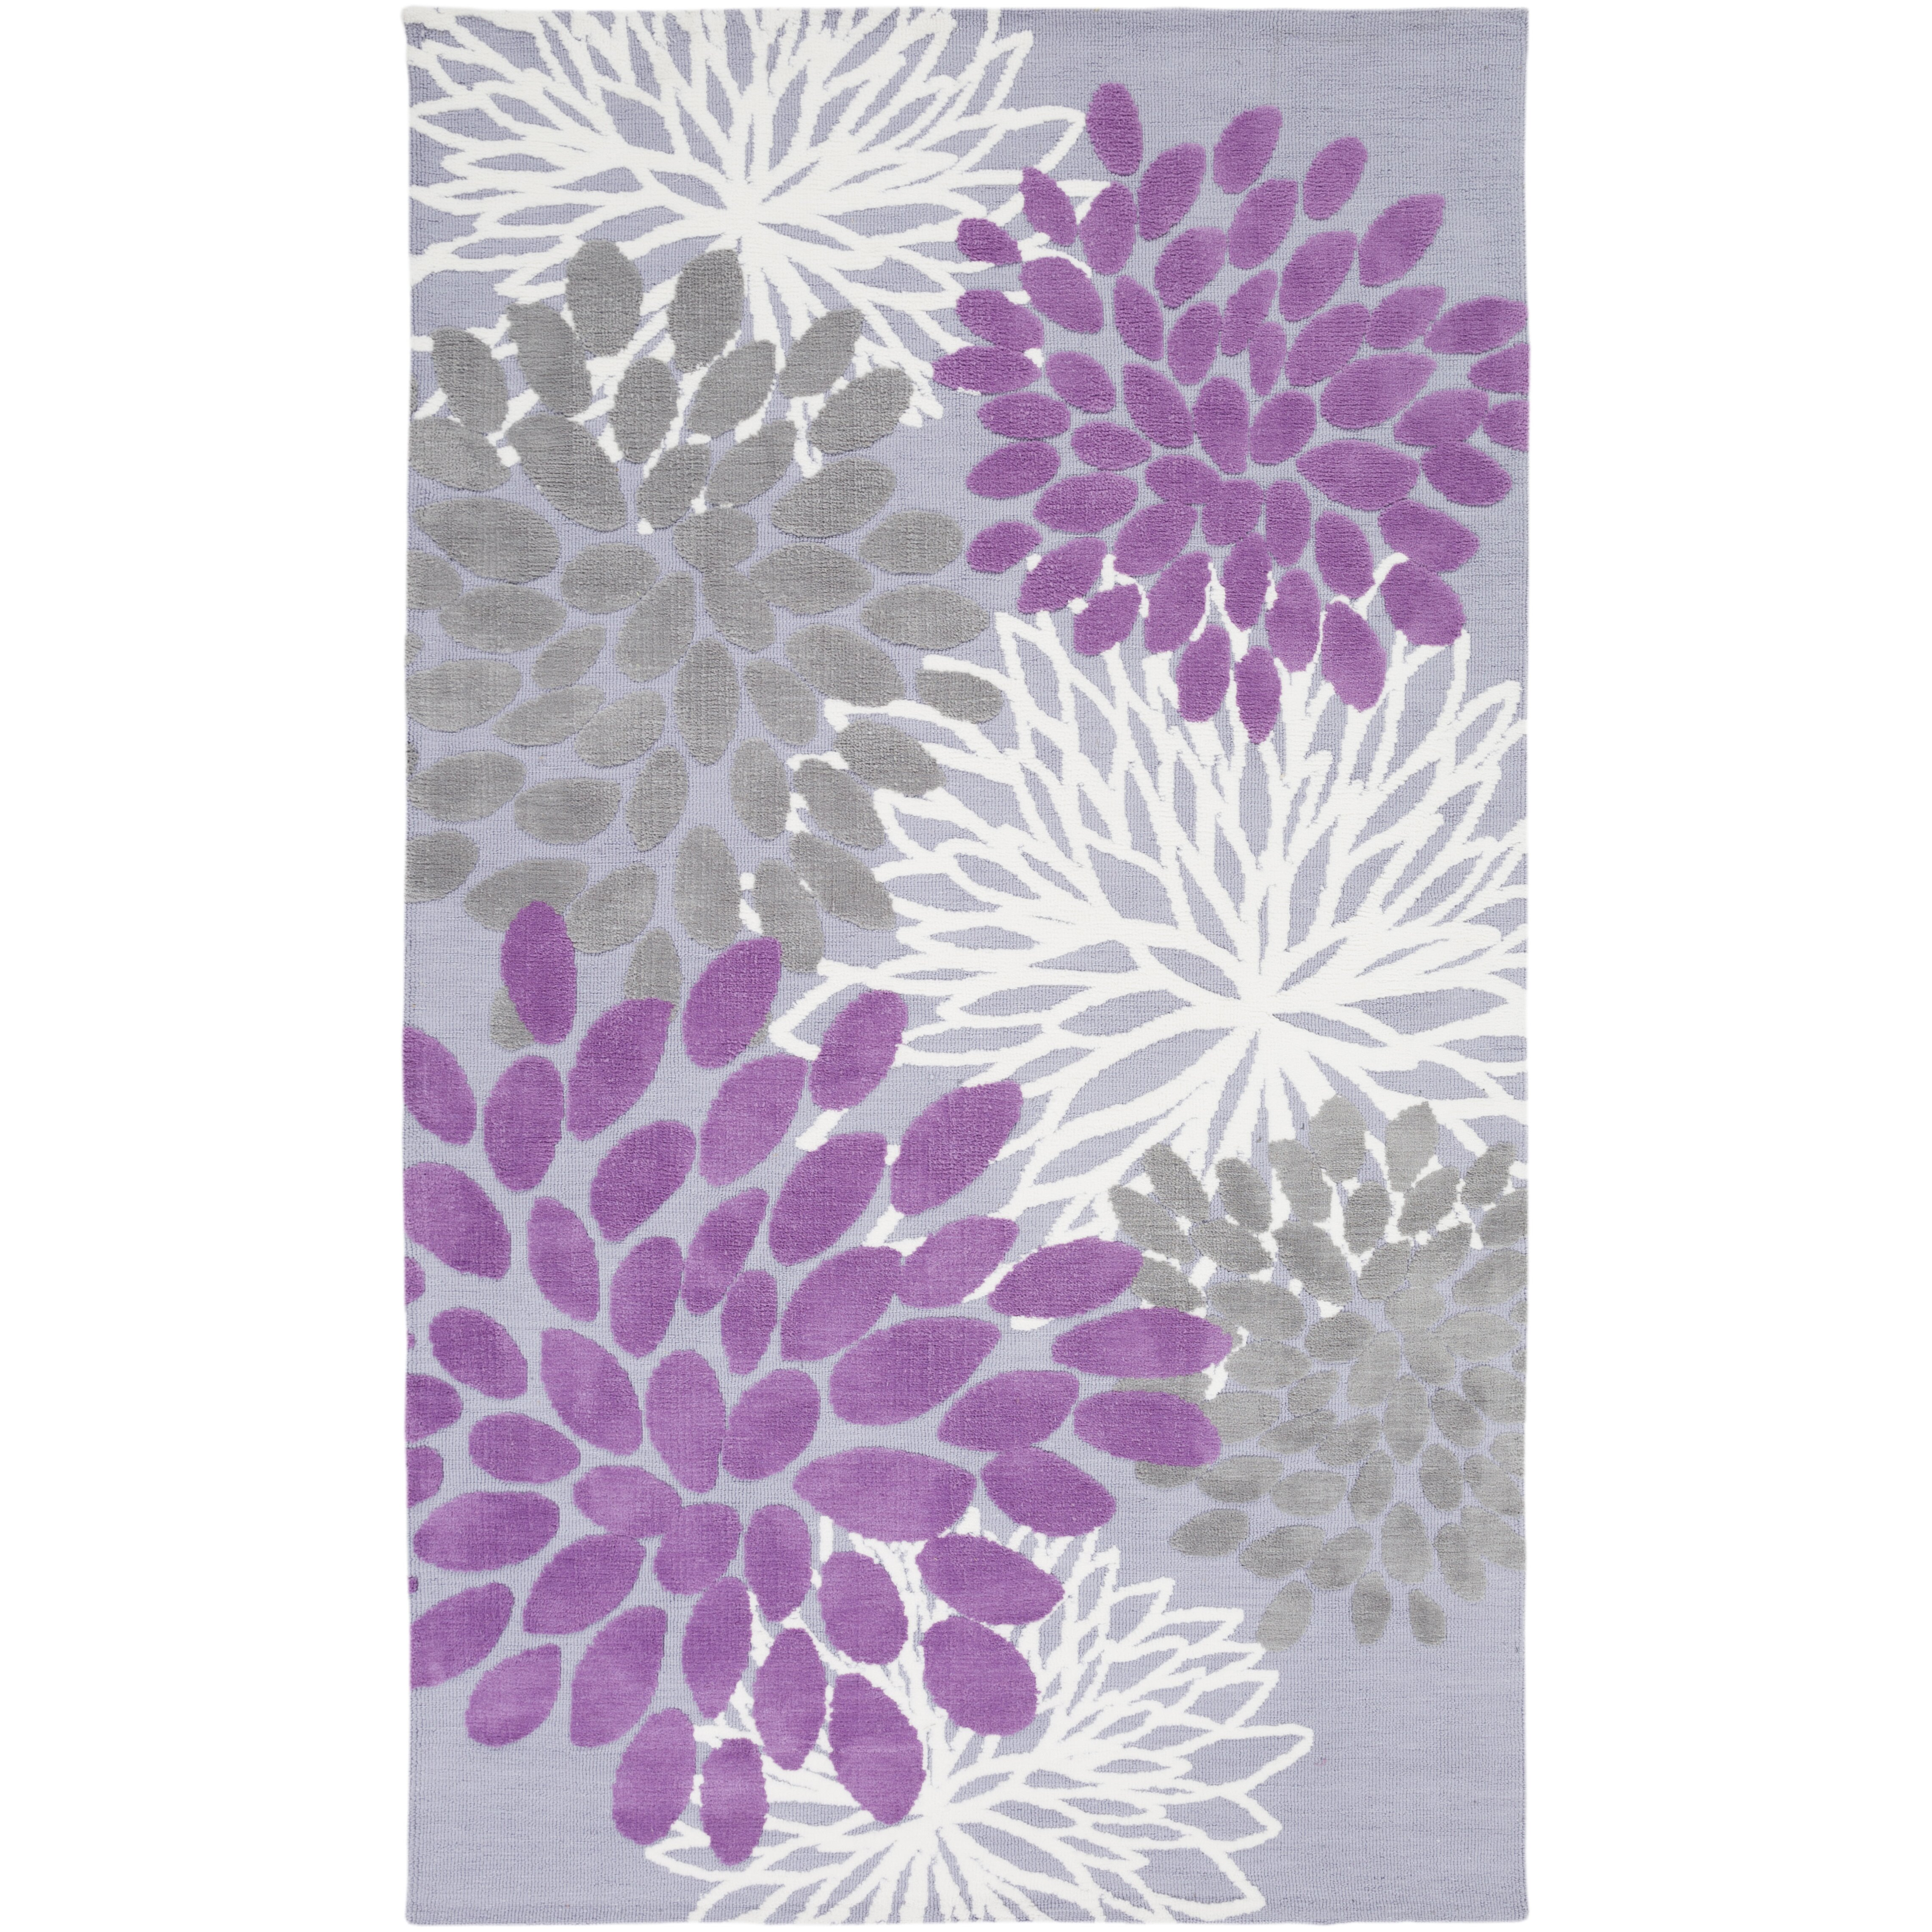 Lavender Rug: Surya Abigail Lavender/Gray Area Rug & Reviews